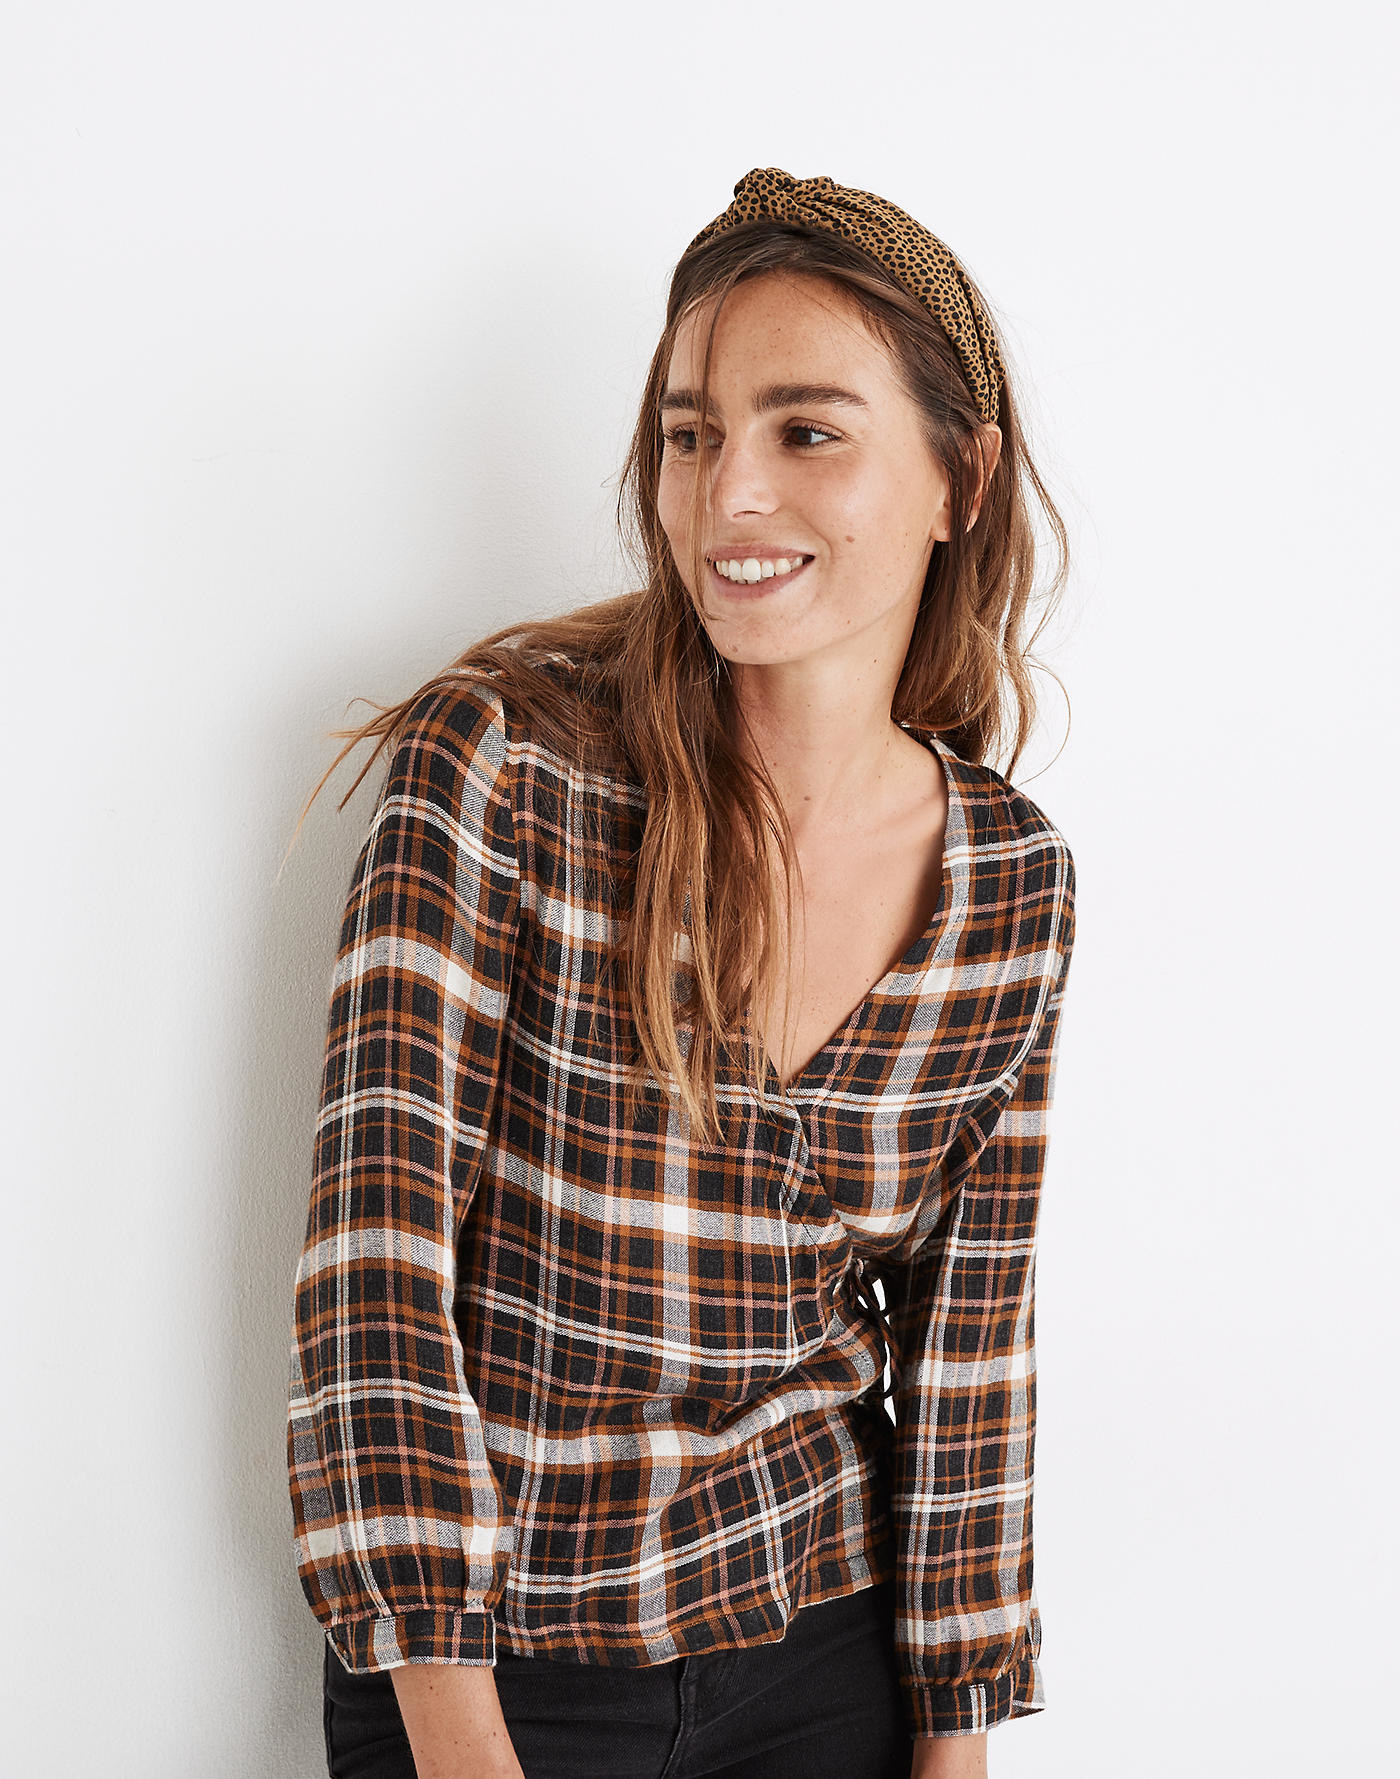 Model wearing plaid shirt